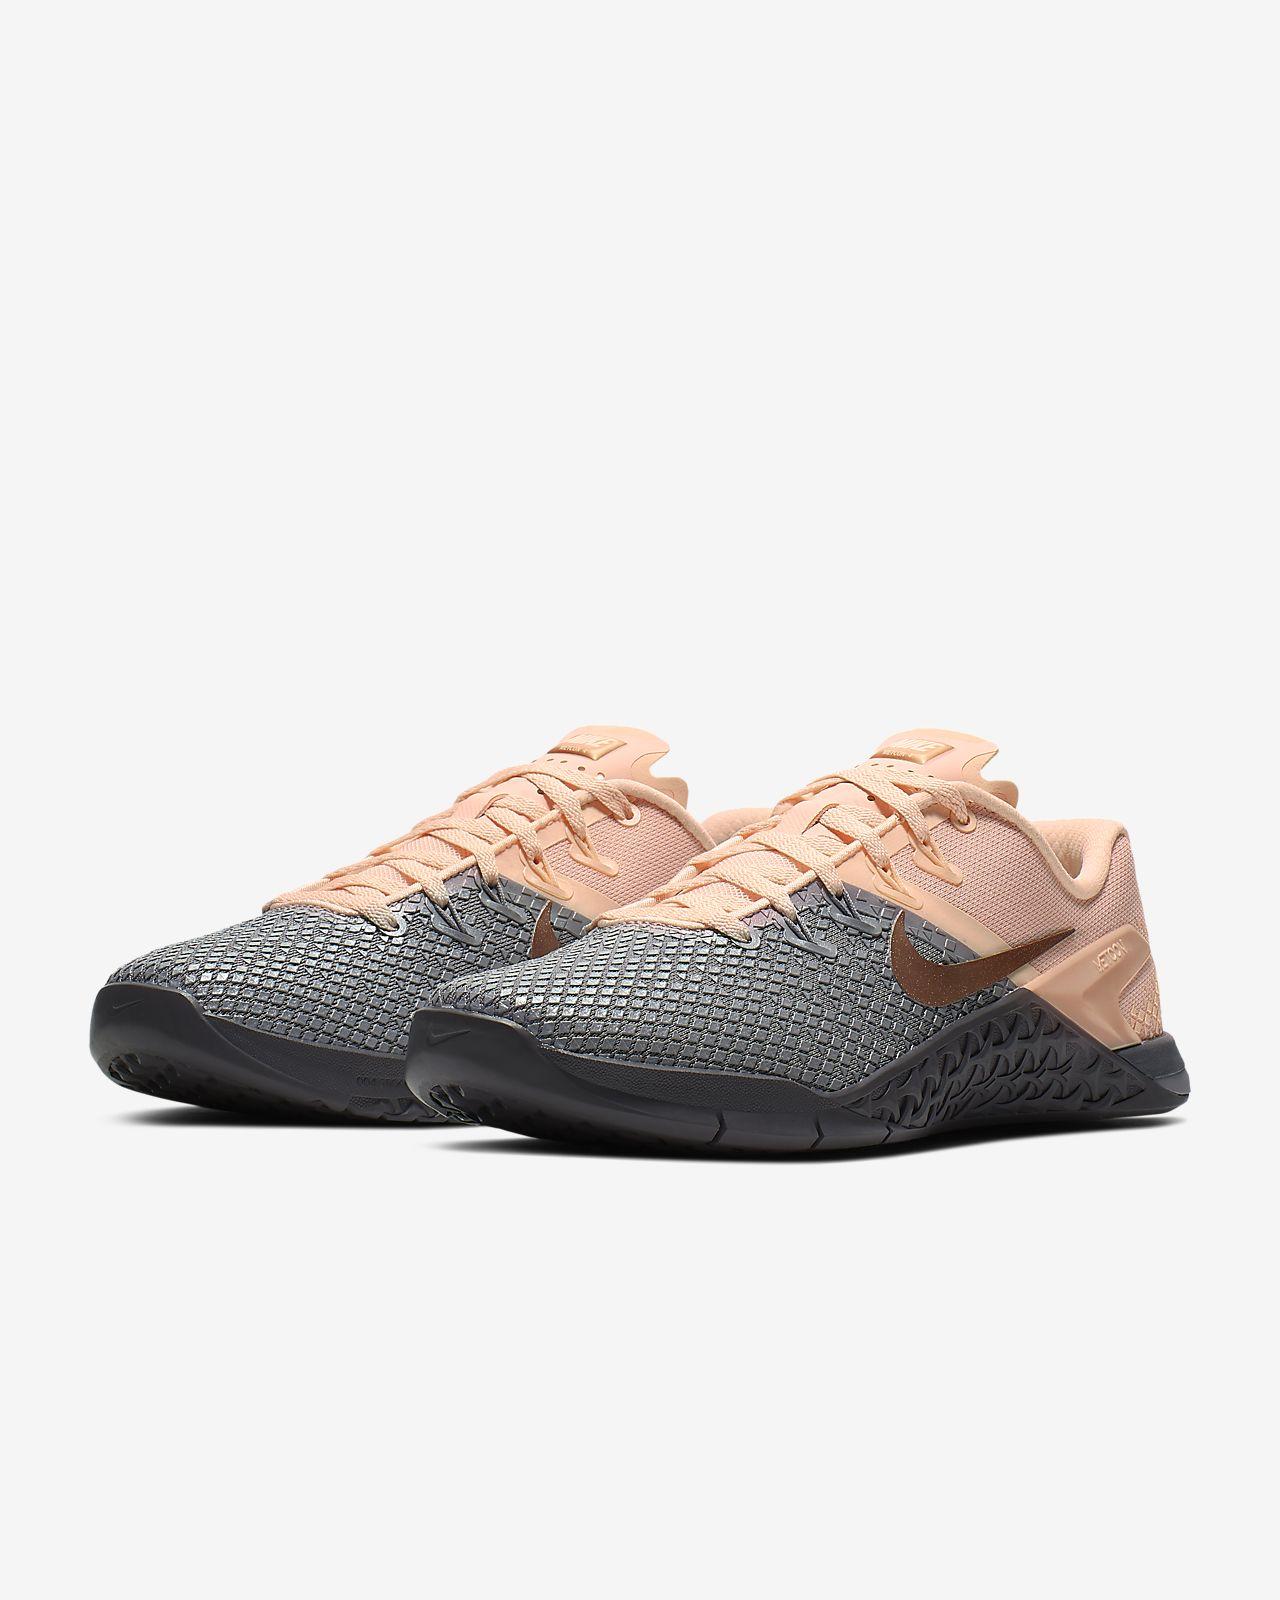 6195774c1f64 Nike Metcon 4 XD Metallic Women s Cross-Training Weightlifting Shoe ...